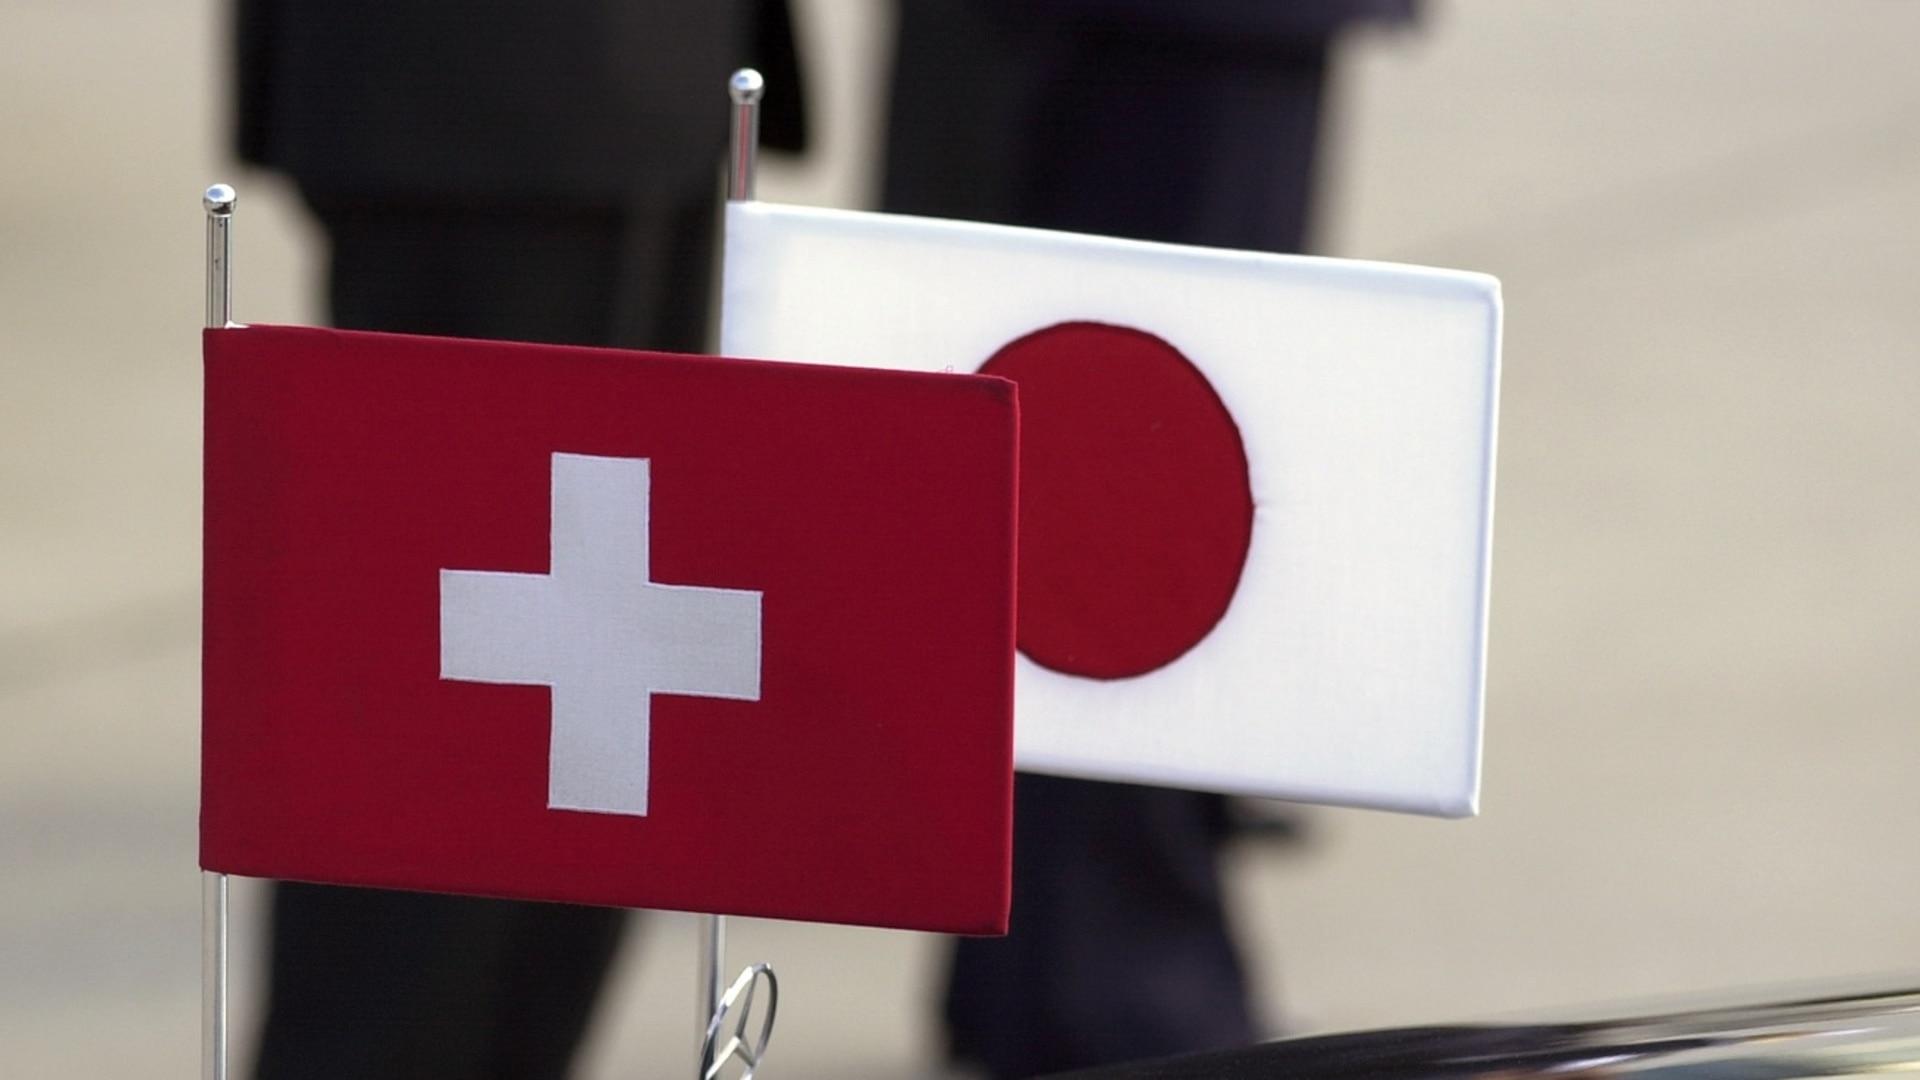 Building a digital assets corridor between Switzerland, Japan and Singapore